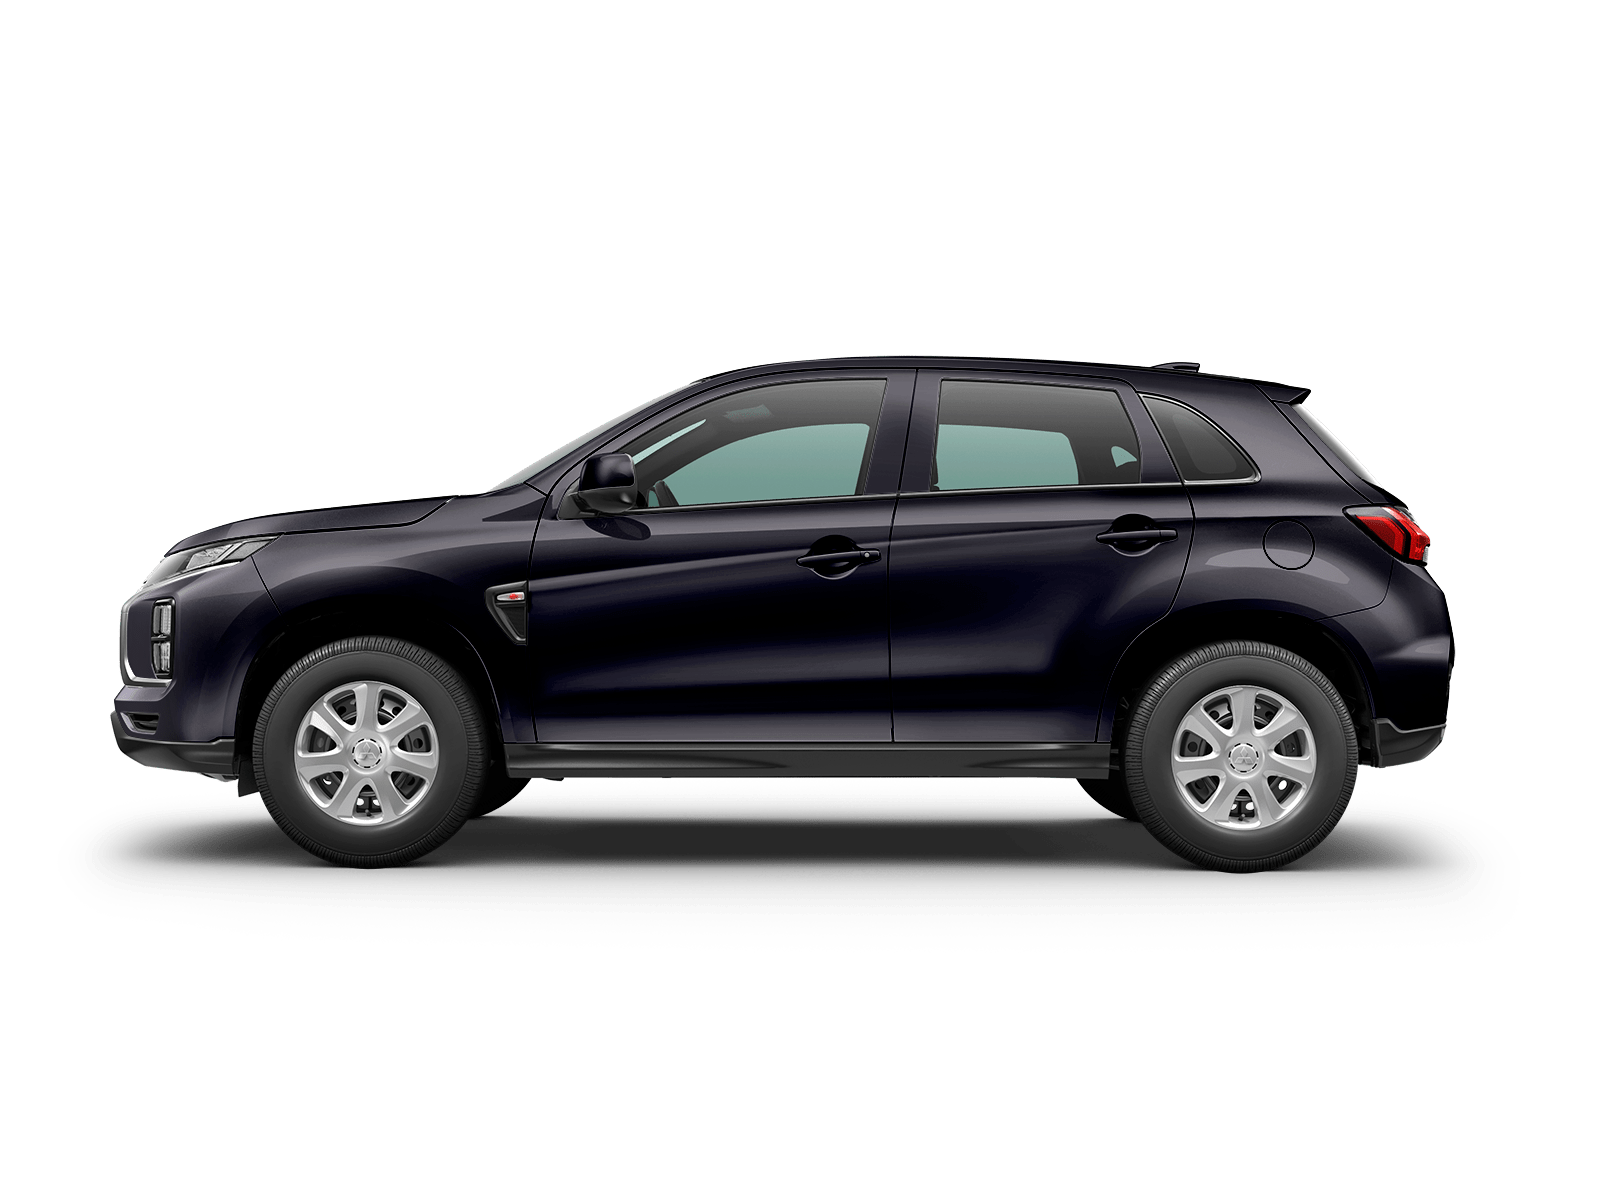 ASX - Styled for adventure | Mitsubishi Motors